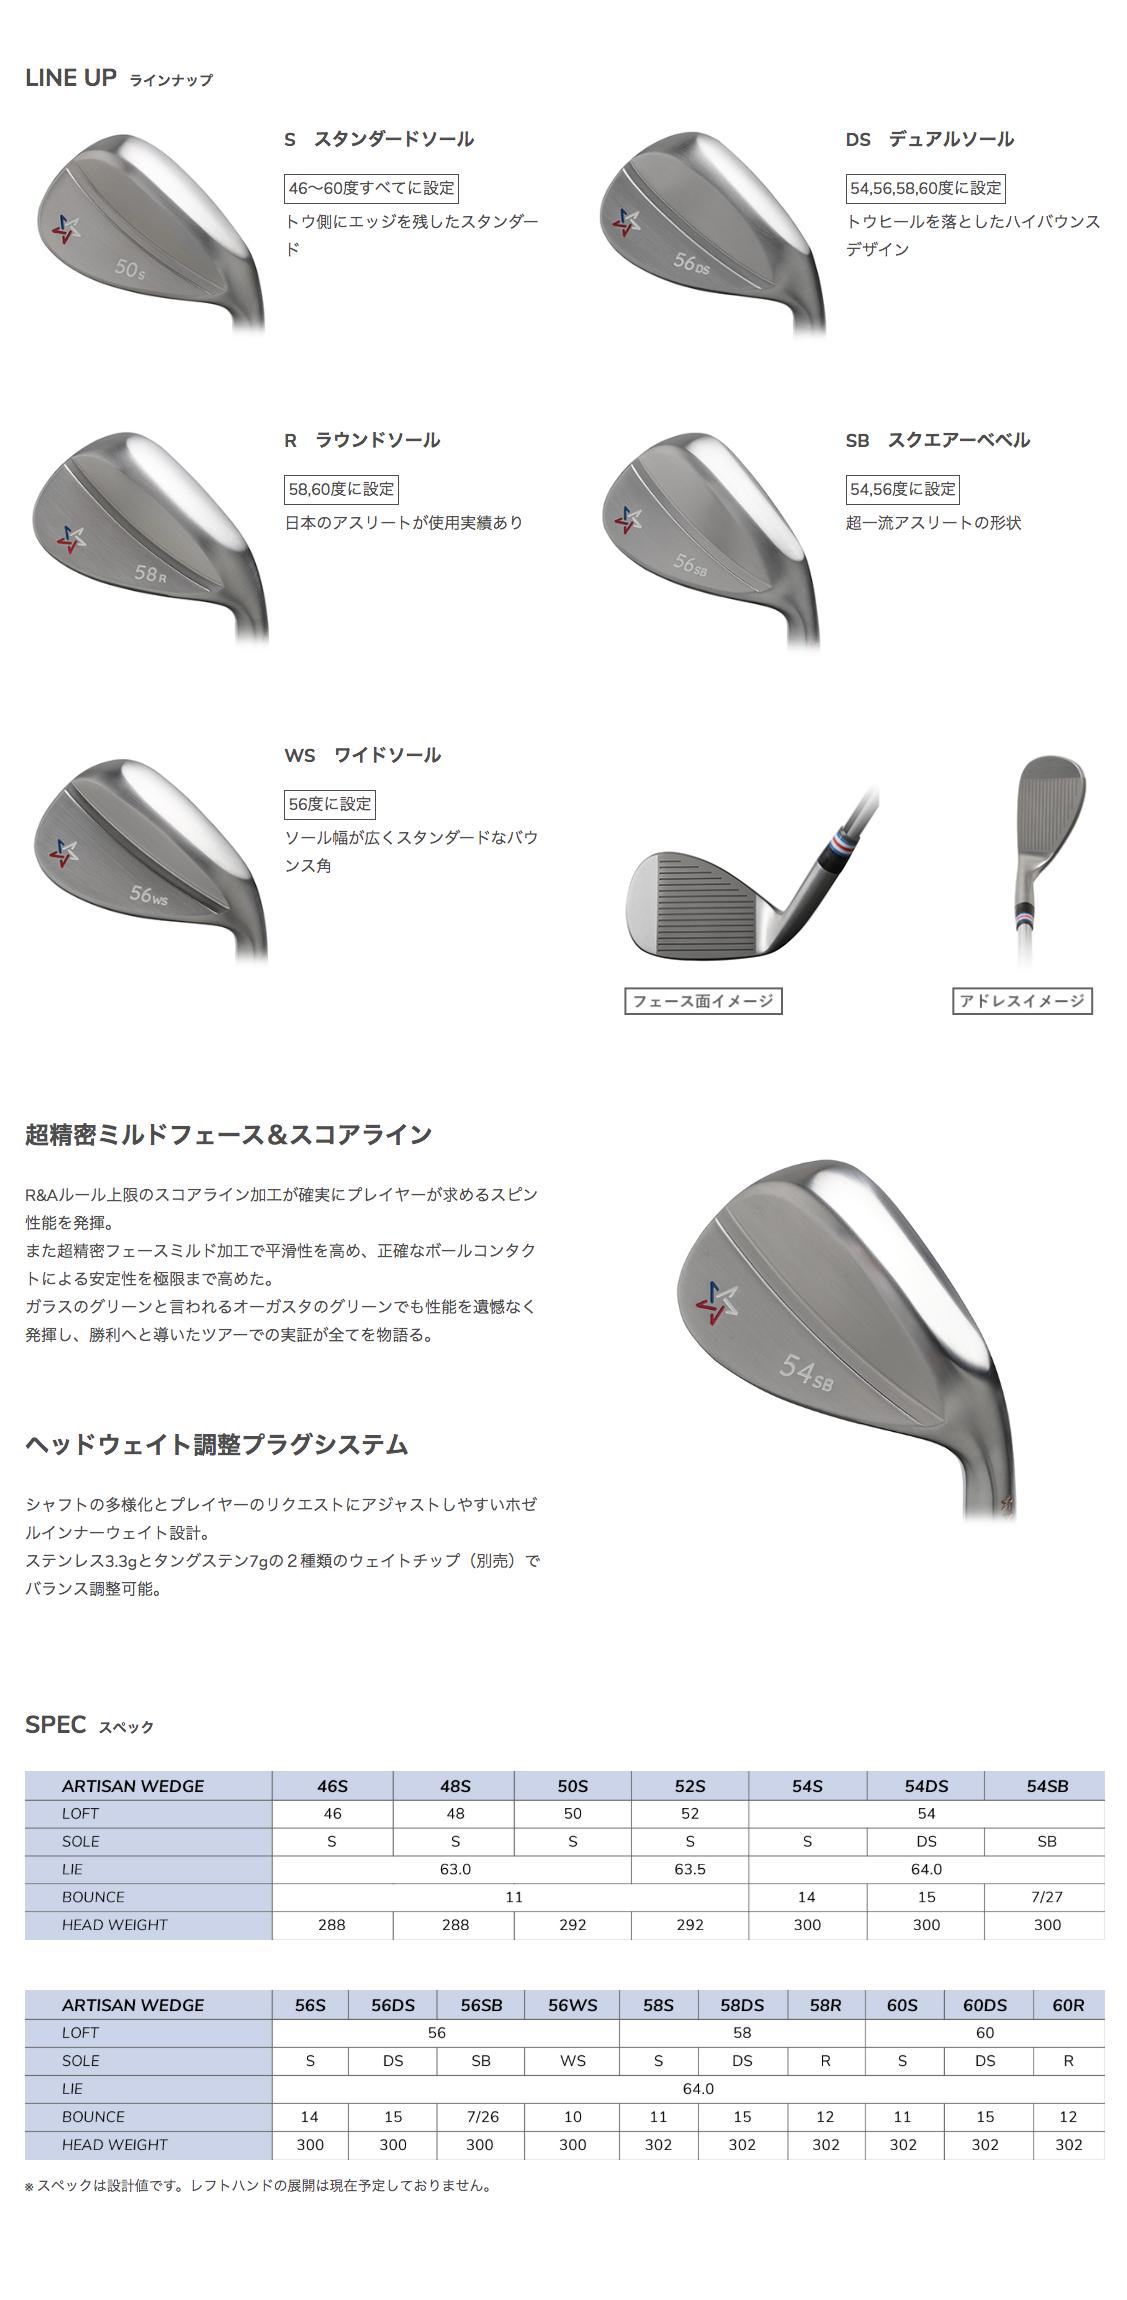 FireShot Capture 129 - インフィニットゴルフオンラインストア - ARTISAN WEDGE Series - shop.infinitegolf.jp